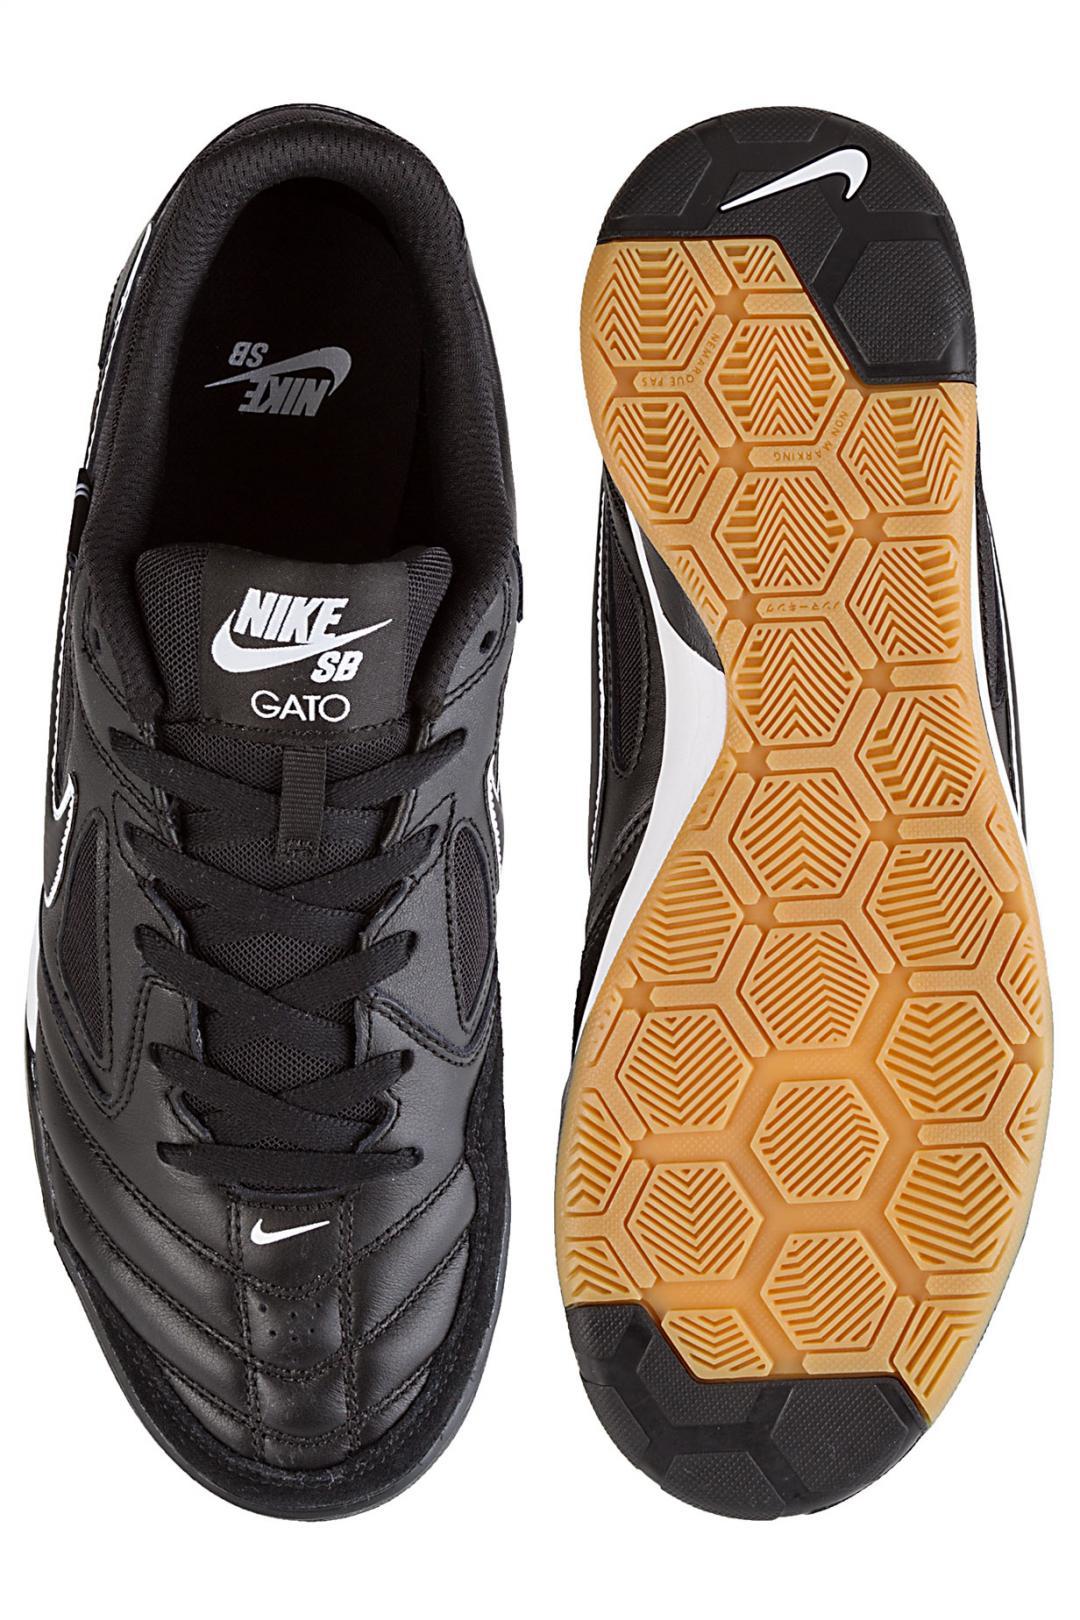 Uomo Nike SB Gato black black white   Sneaker